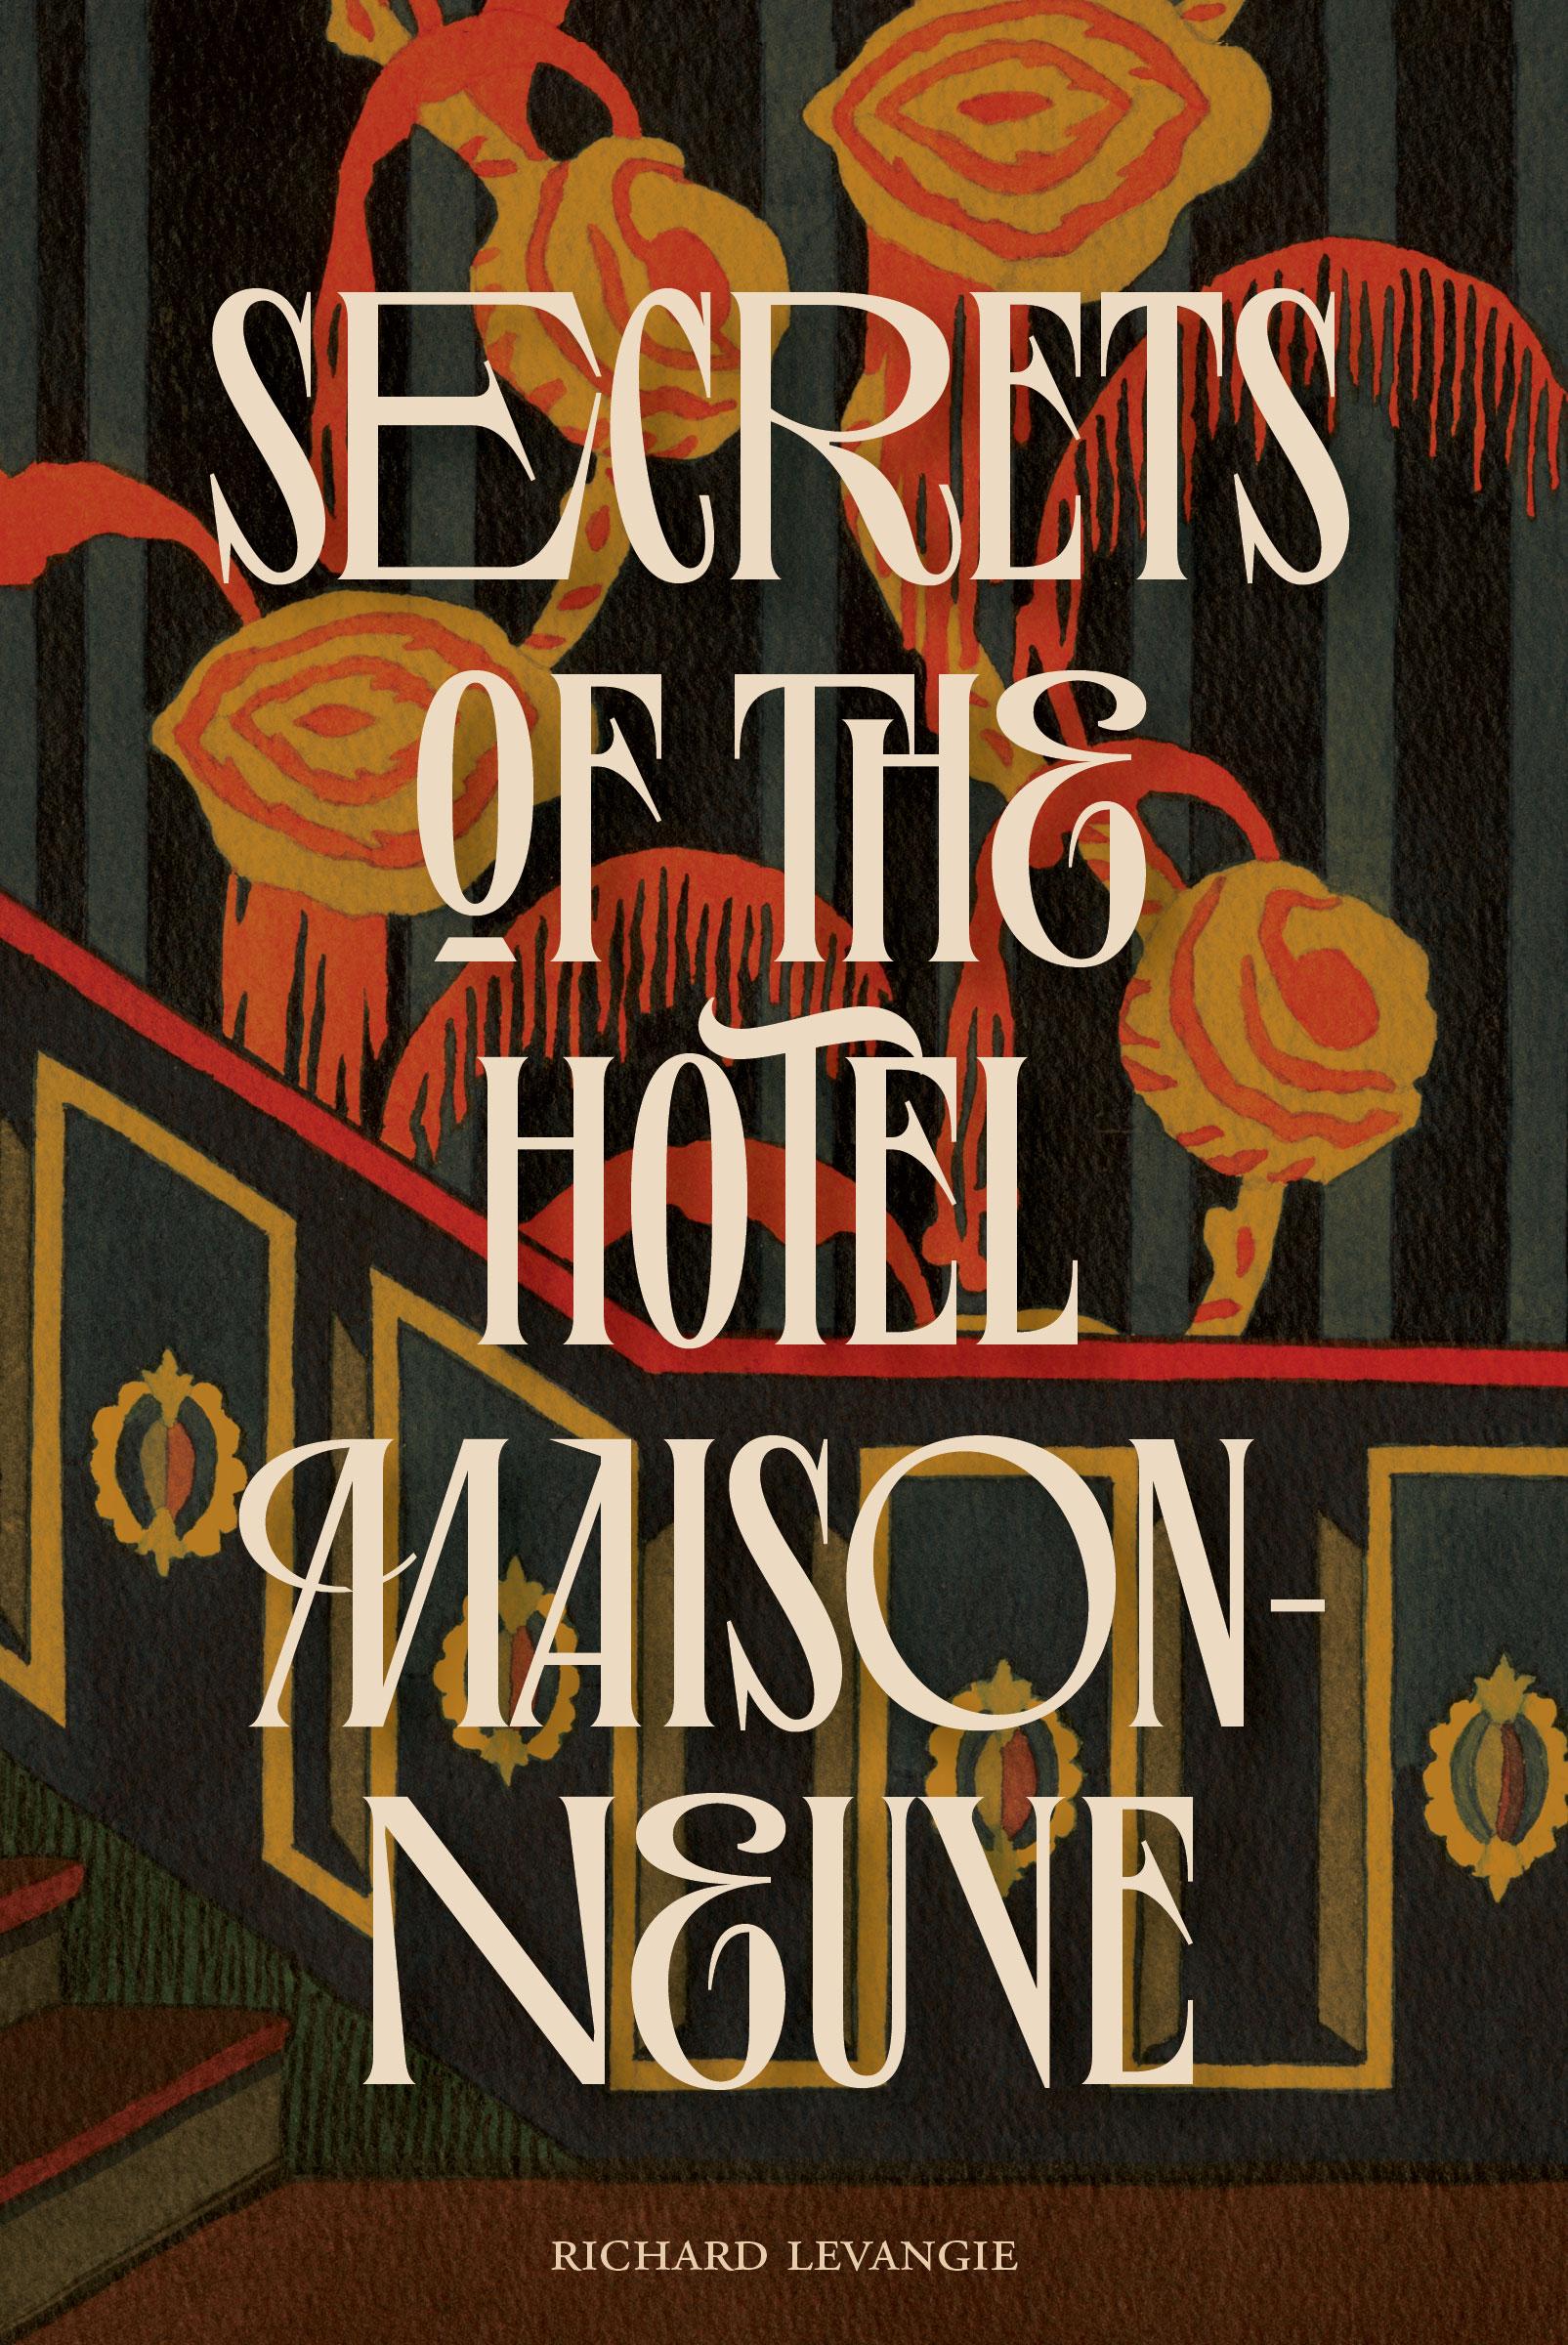 Chris Benjamin Reviews Richard Levangie's Secrets of the Hotel Maisonneuve